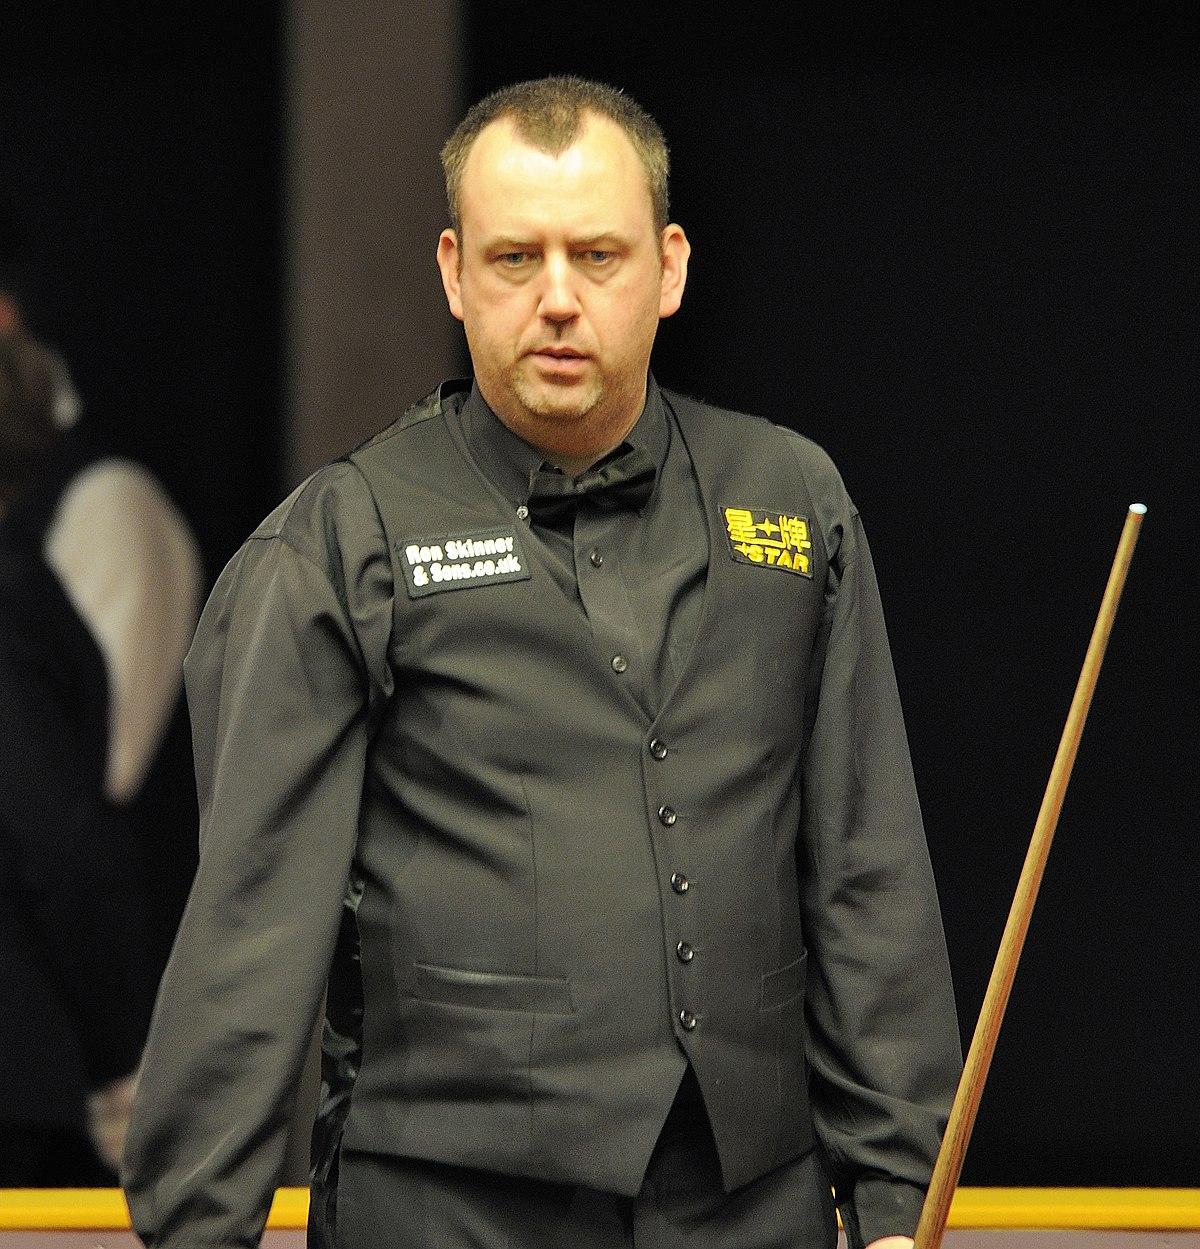 Mark williams snooker